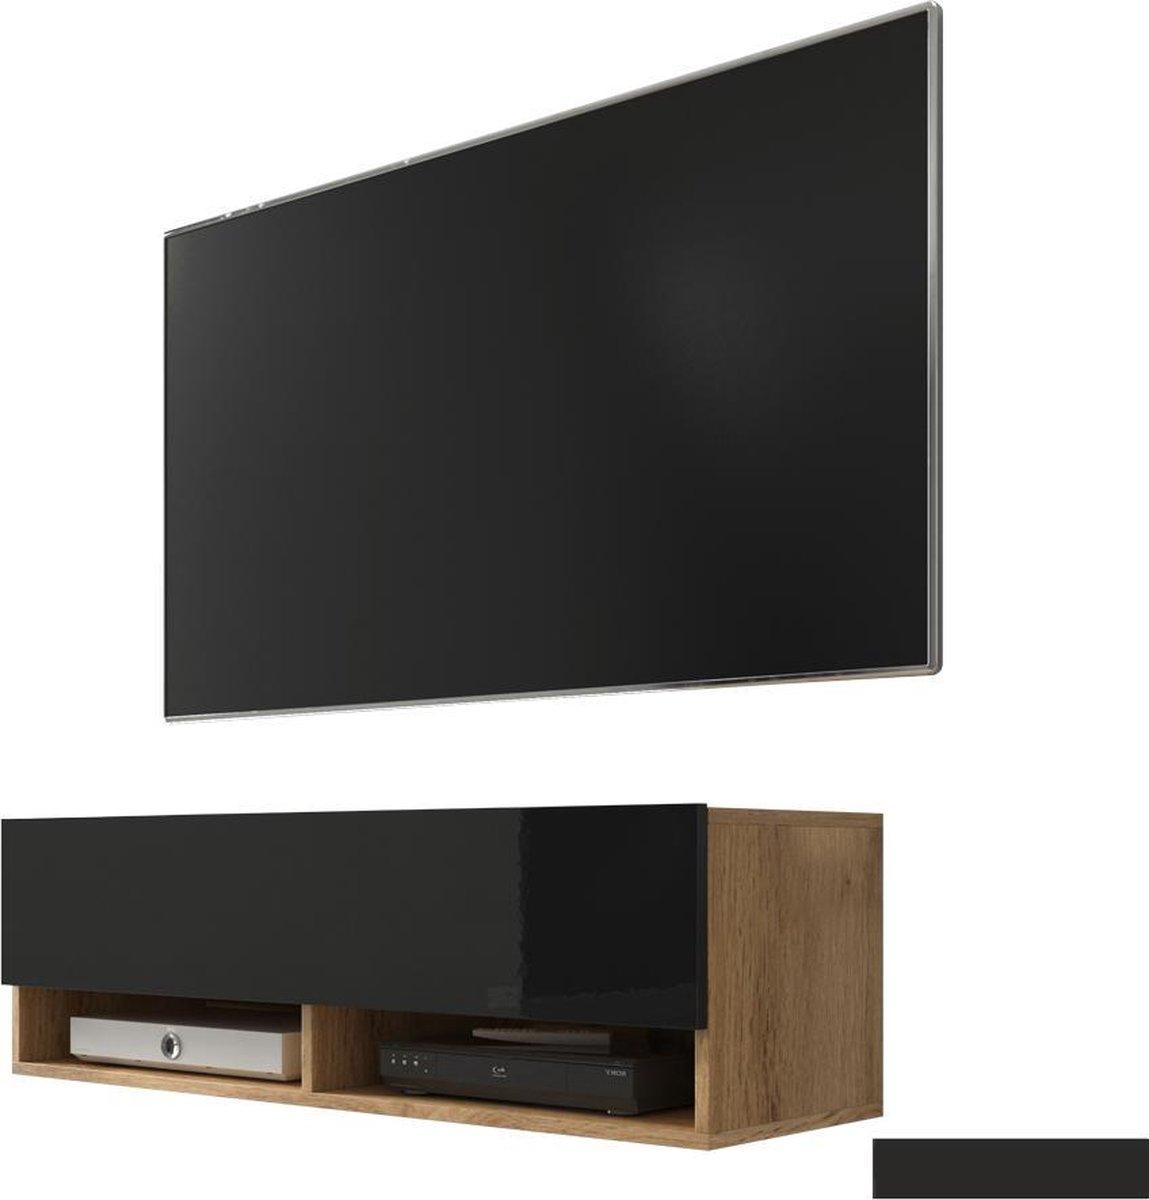 Maison's Tv meubel – Tv Kast meubel – Tv meubel – Tv Meubels – Tv meubels Hout – Eiken hout  – Bruin – Zwart –Wander – No LED – 100x30x32,5 kopen